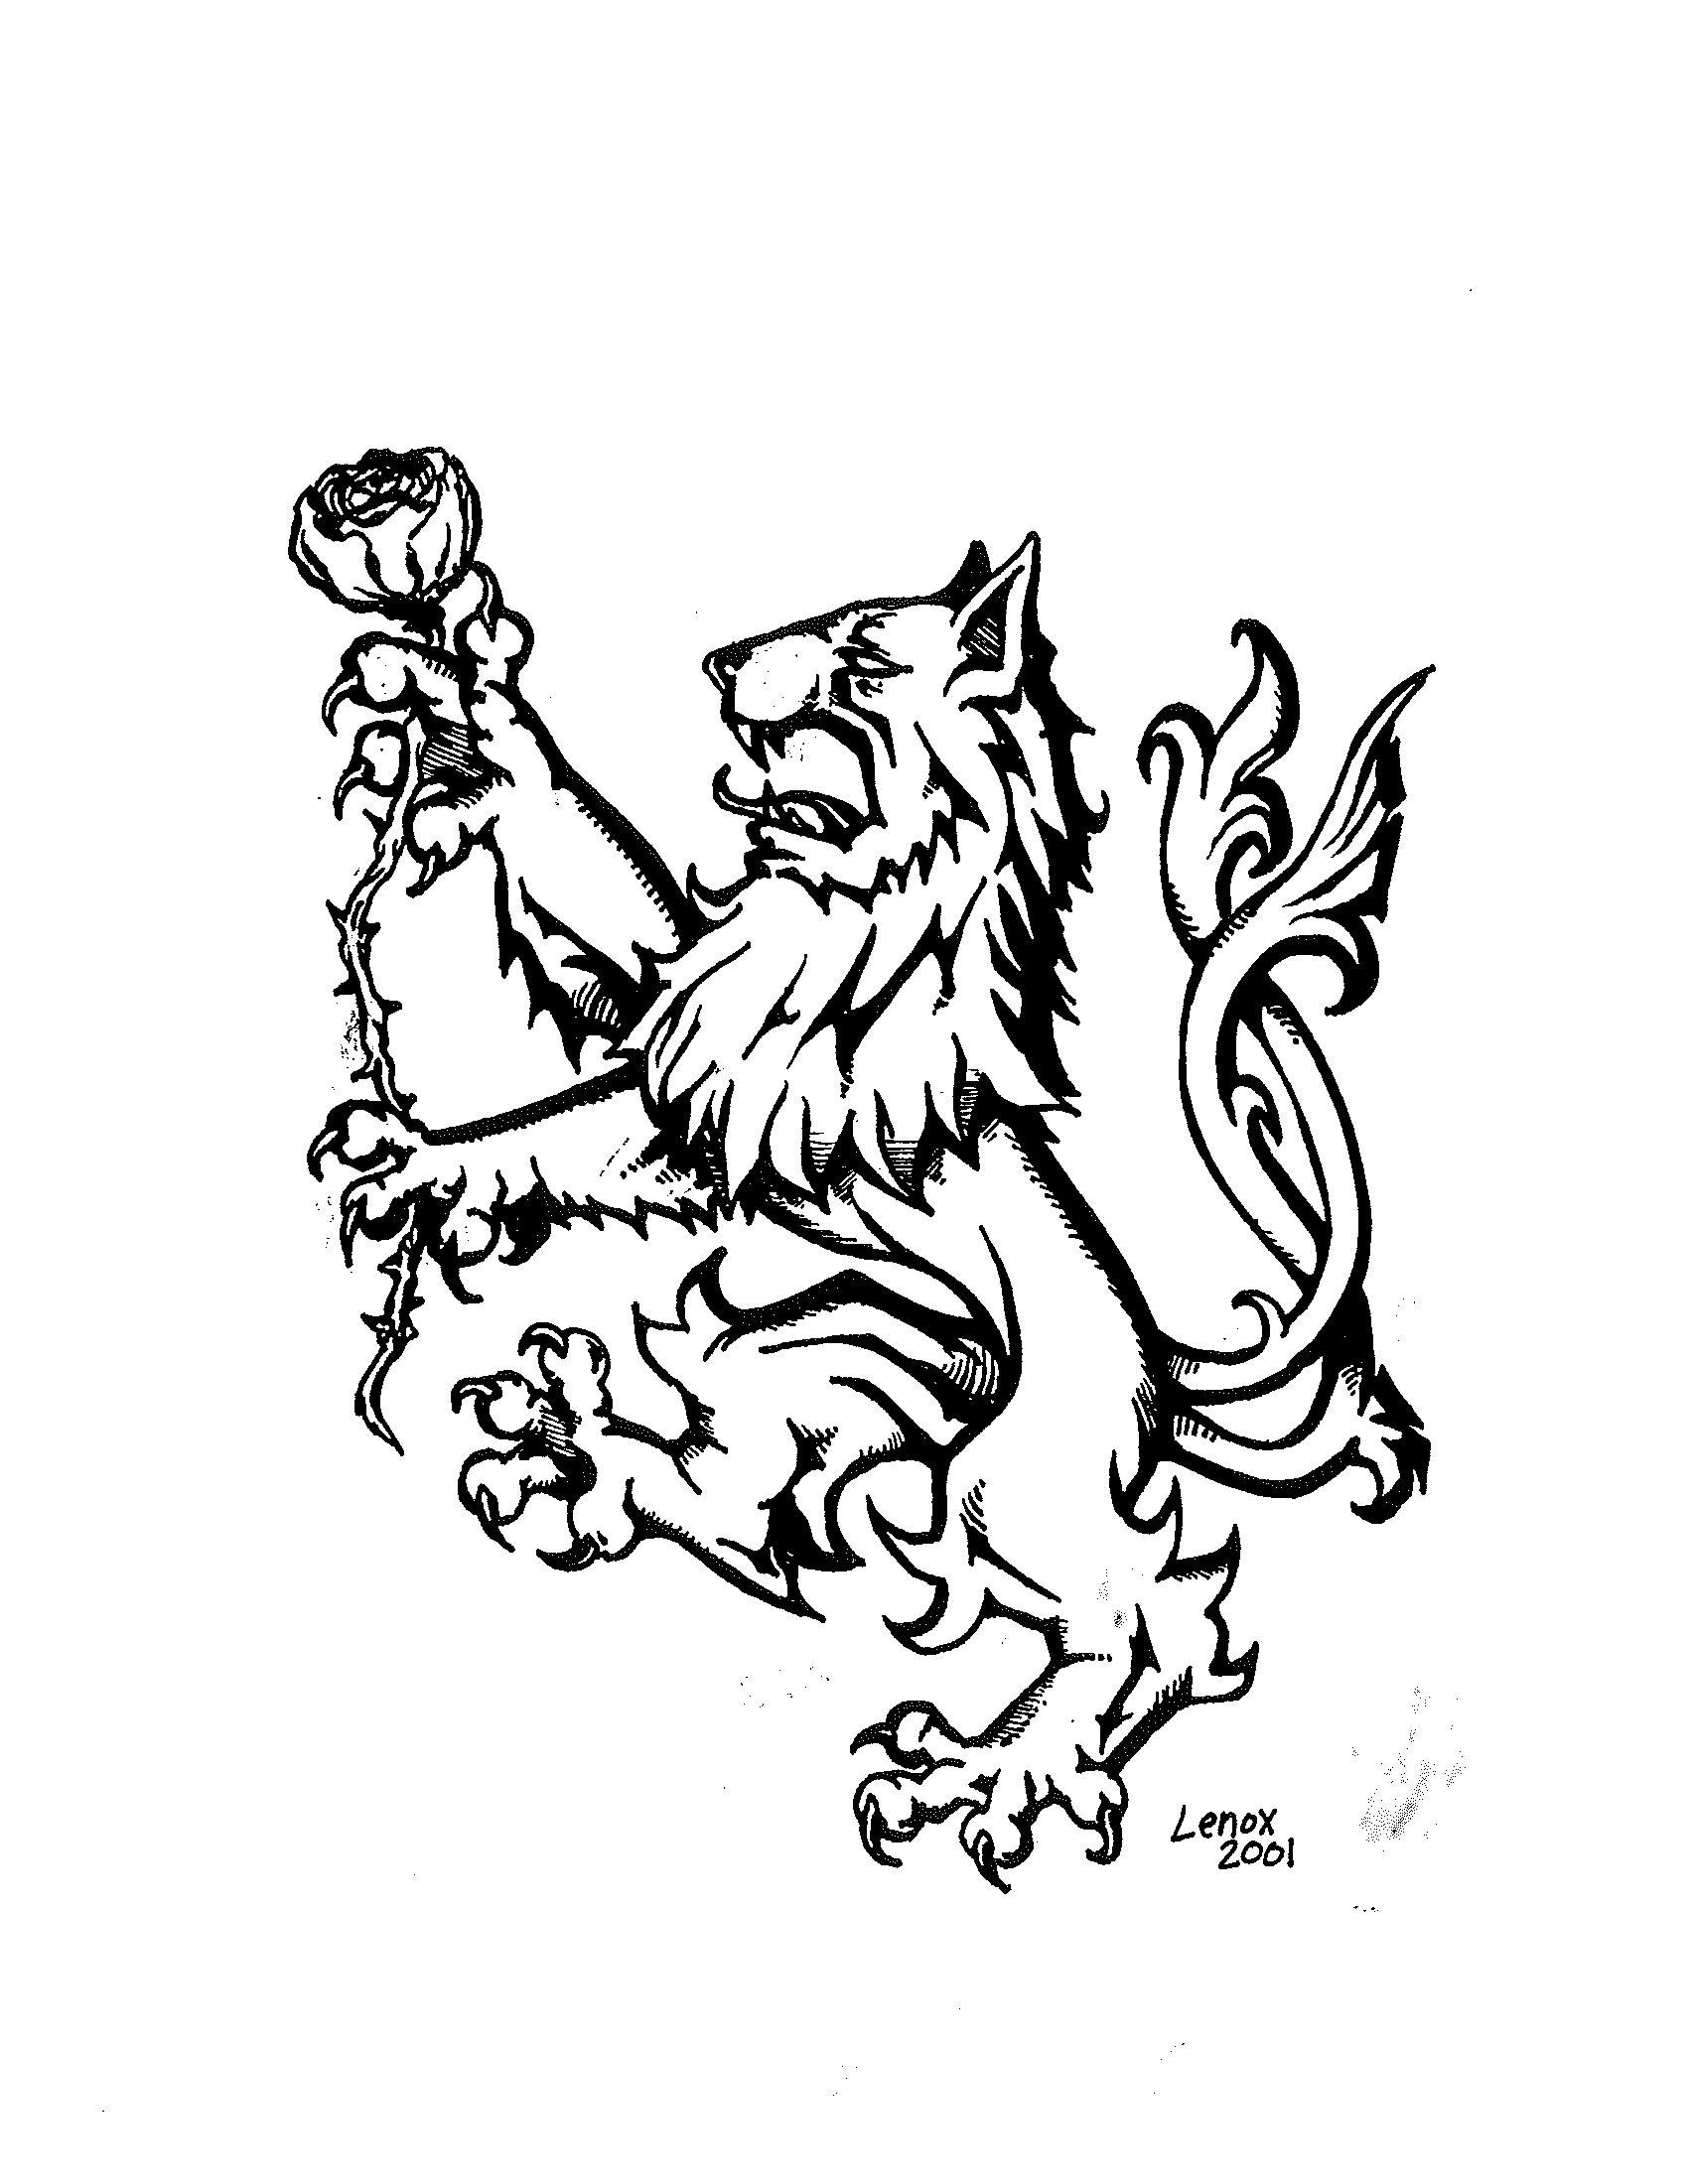 1704x2200 Lion Holding Rose 2001 Lambda Chi Alpha Logo Jason Lenox